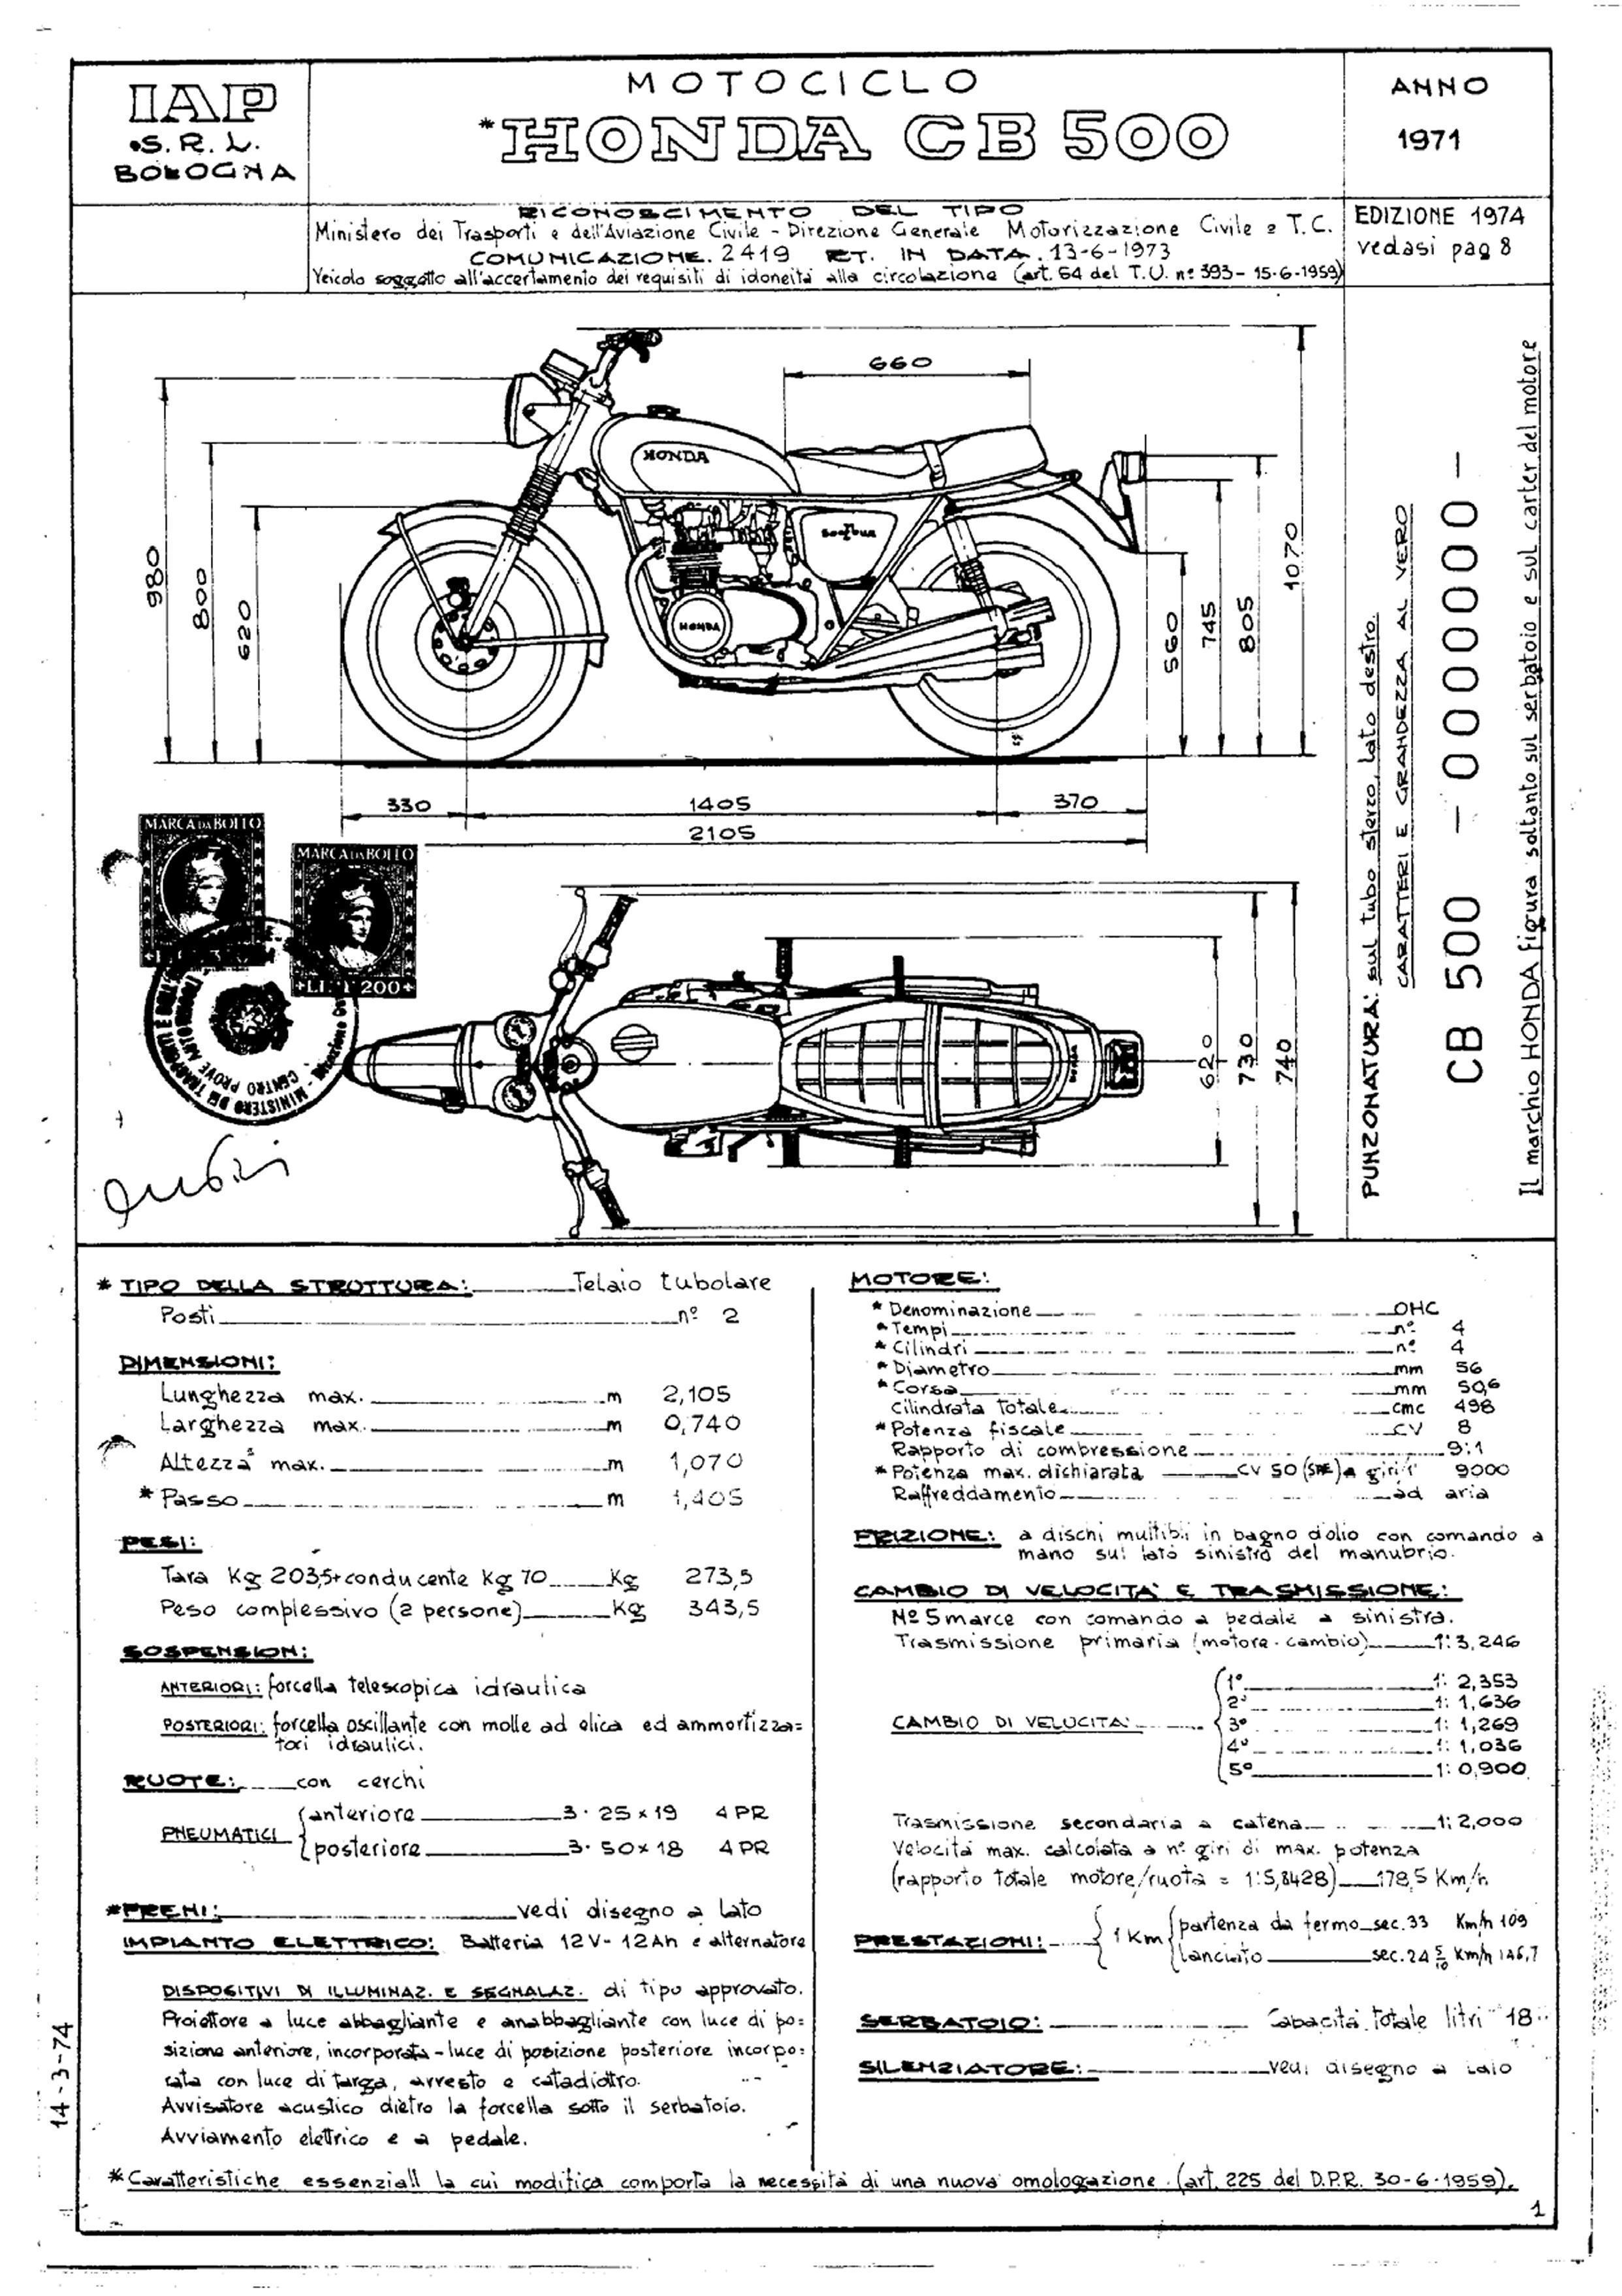 Conformity Declaration CB500 (Italian) (1974)